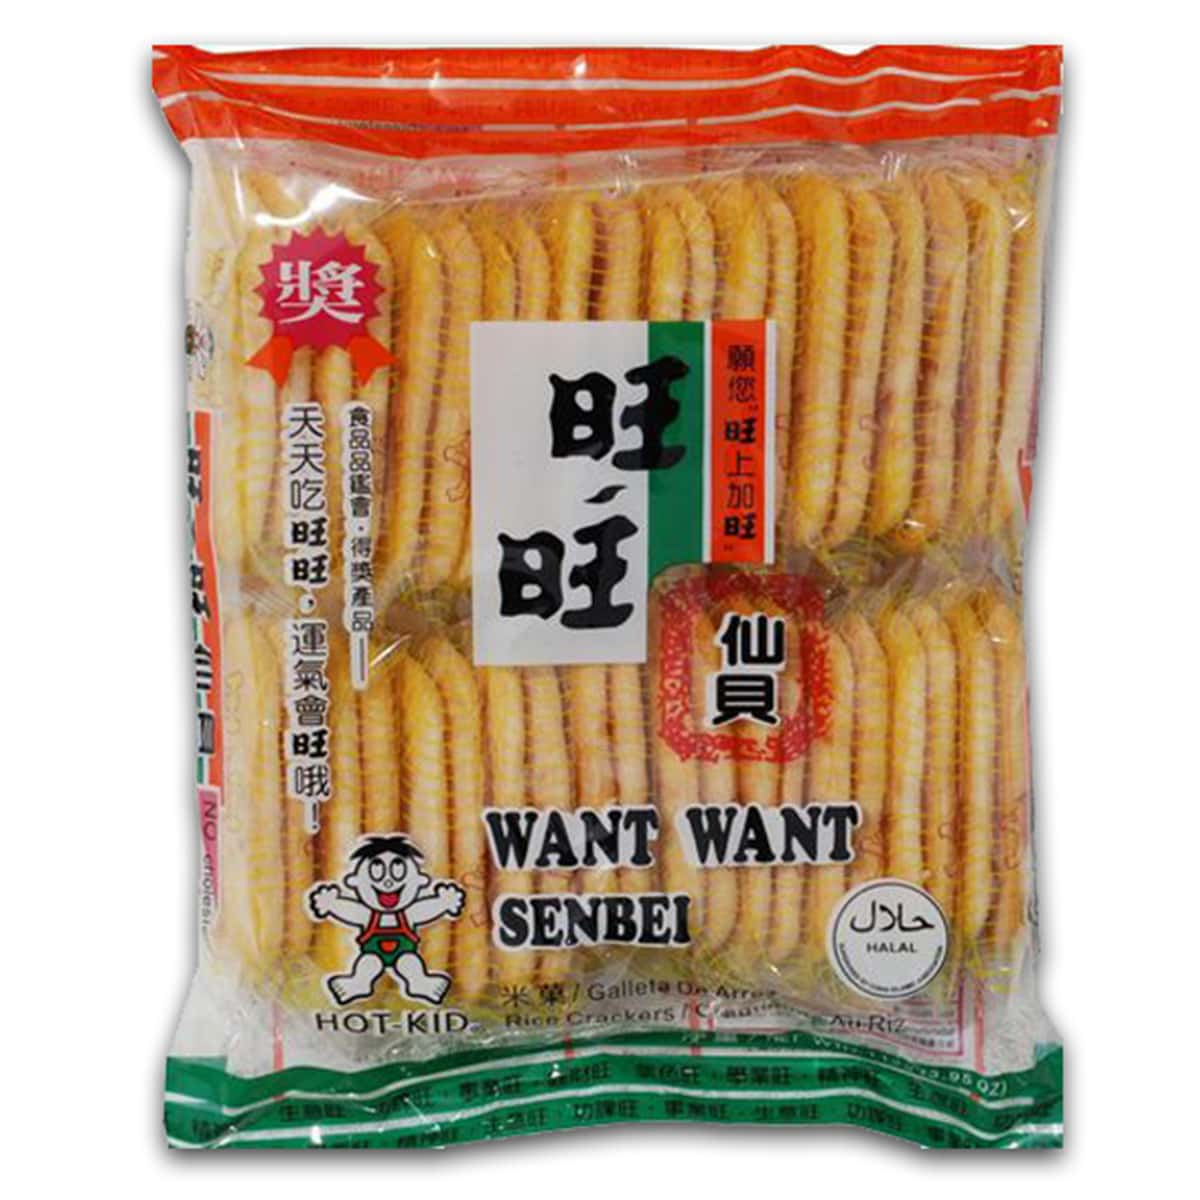 Buy Want Want Hot-kid Senbei Rice Crackers - 112 gm